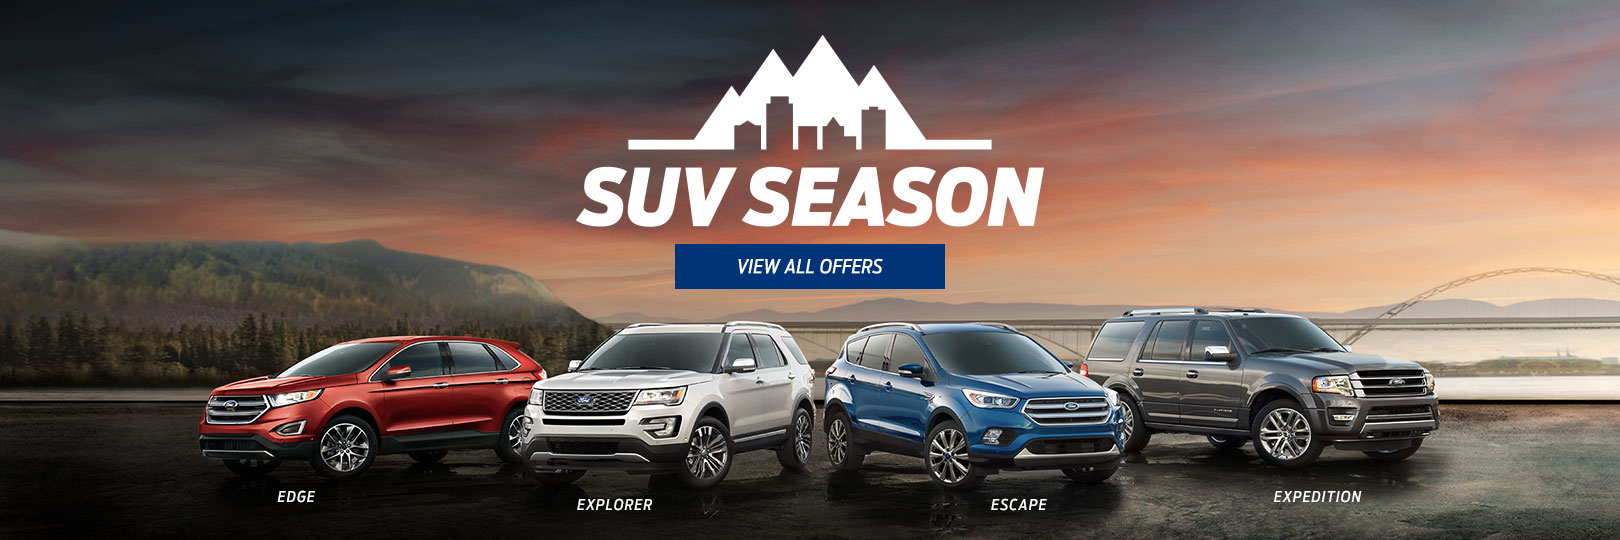 Previous Next & New Ford and Used Car Dealer Serving Livermore | Livermore Ford markmcfarlin.com